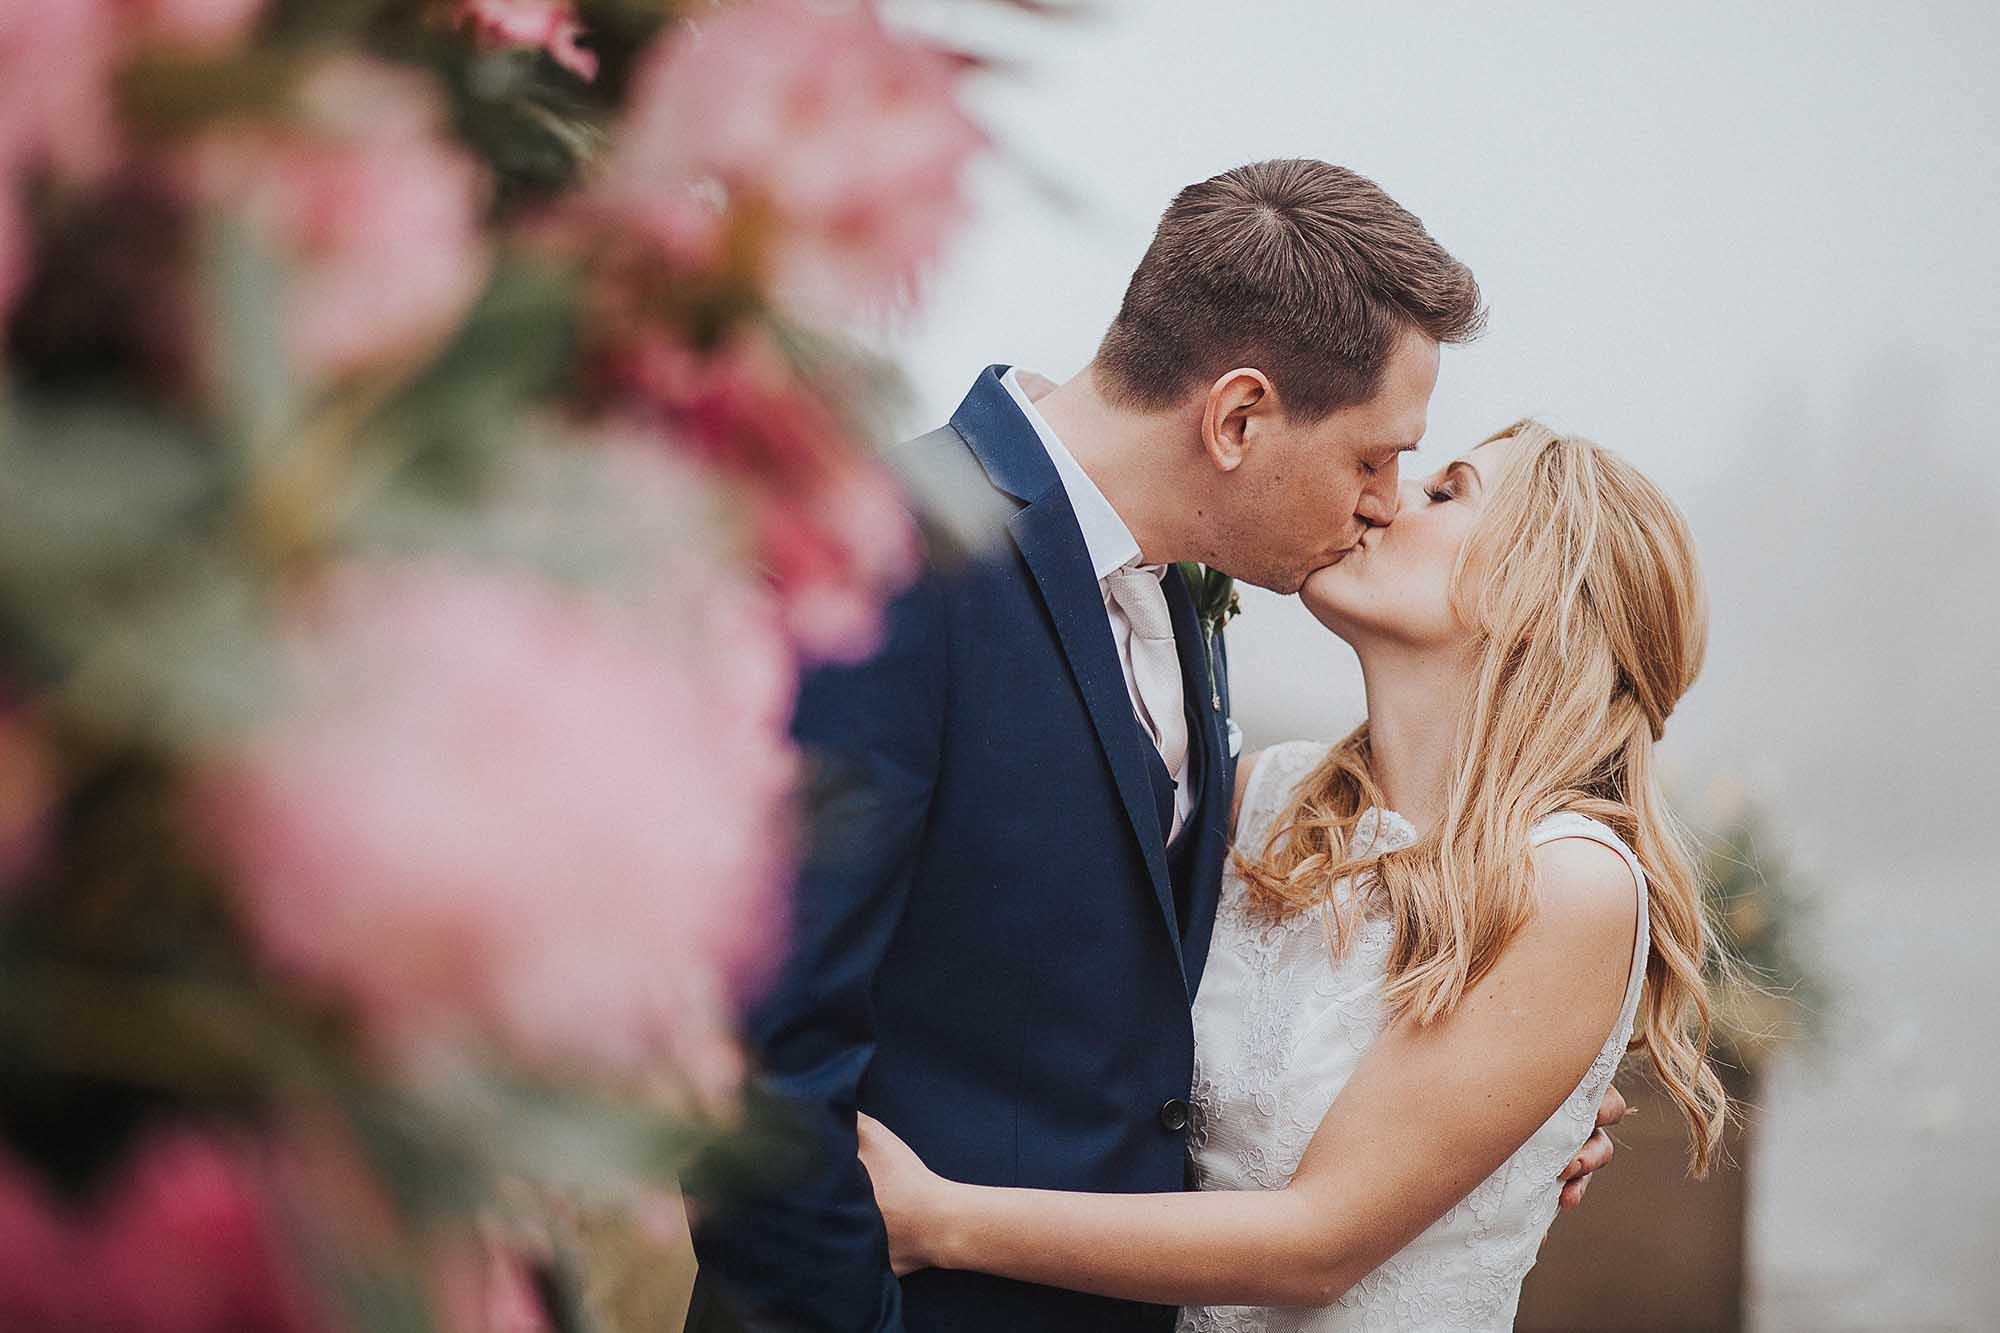 The White Hart Inn Saddleworth wedding